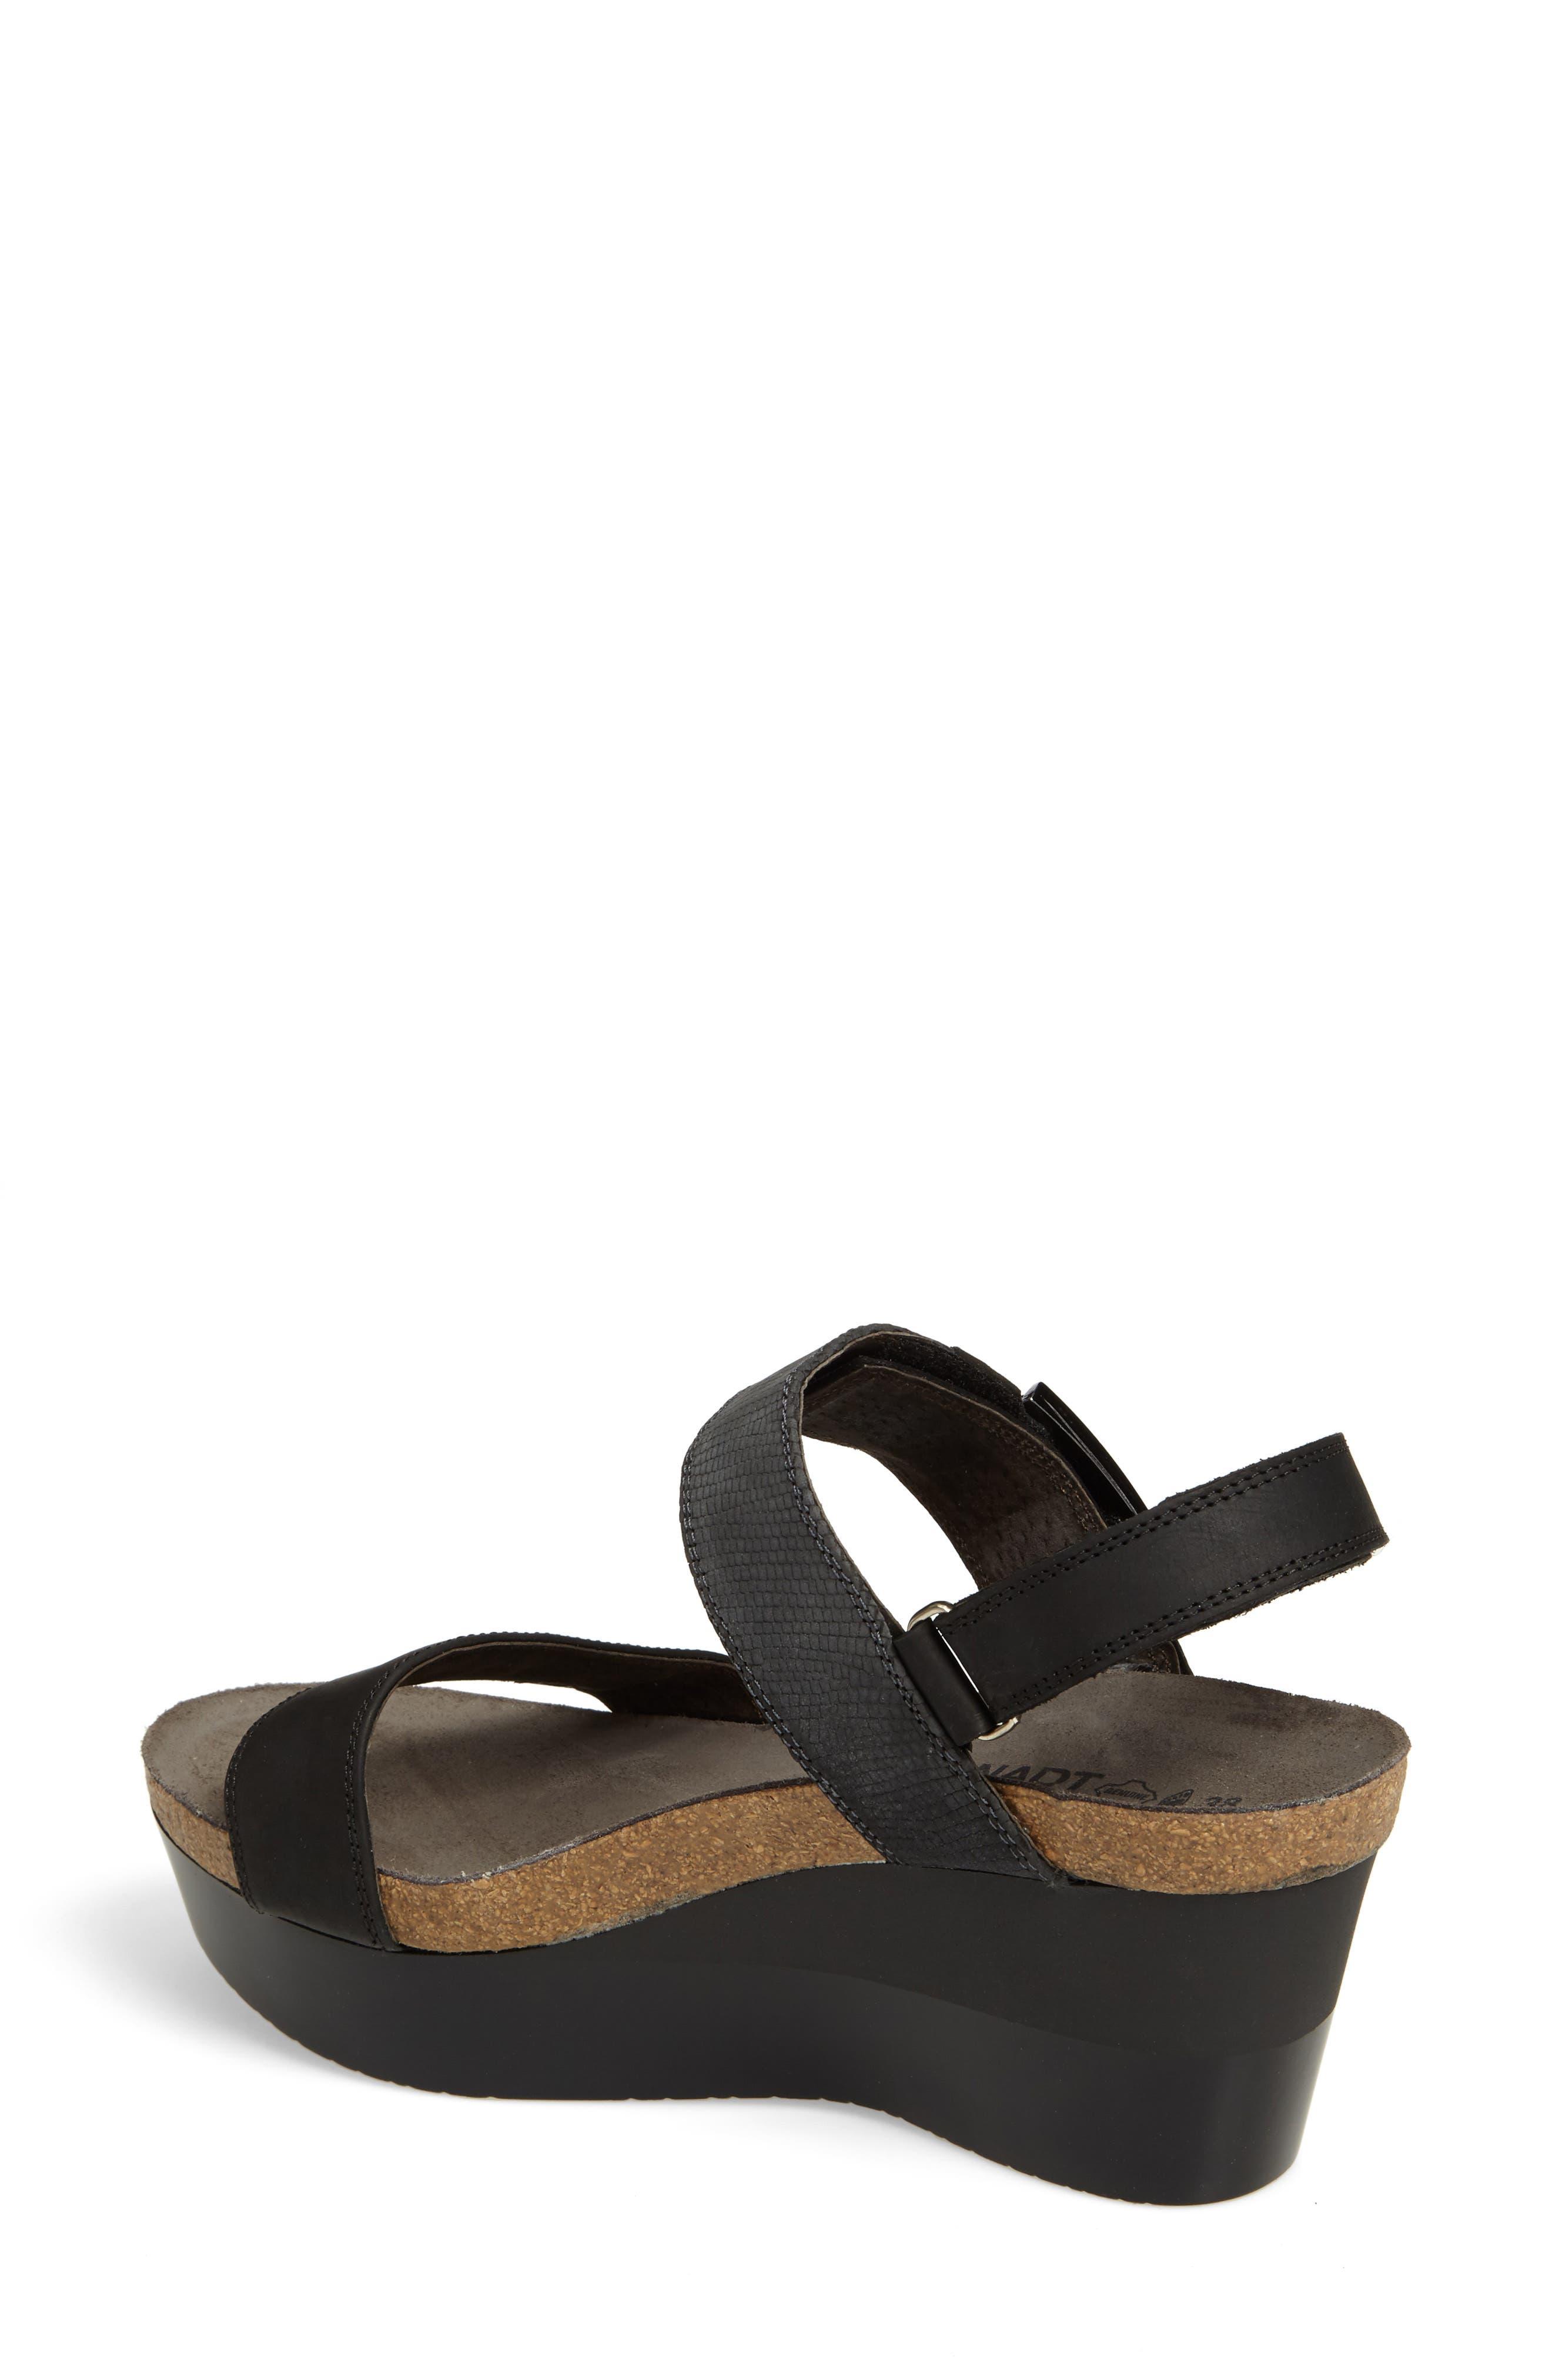 Alpha Platform Wedge Sandal Sandal,                             Alternate thumbnail 2, color,                             020